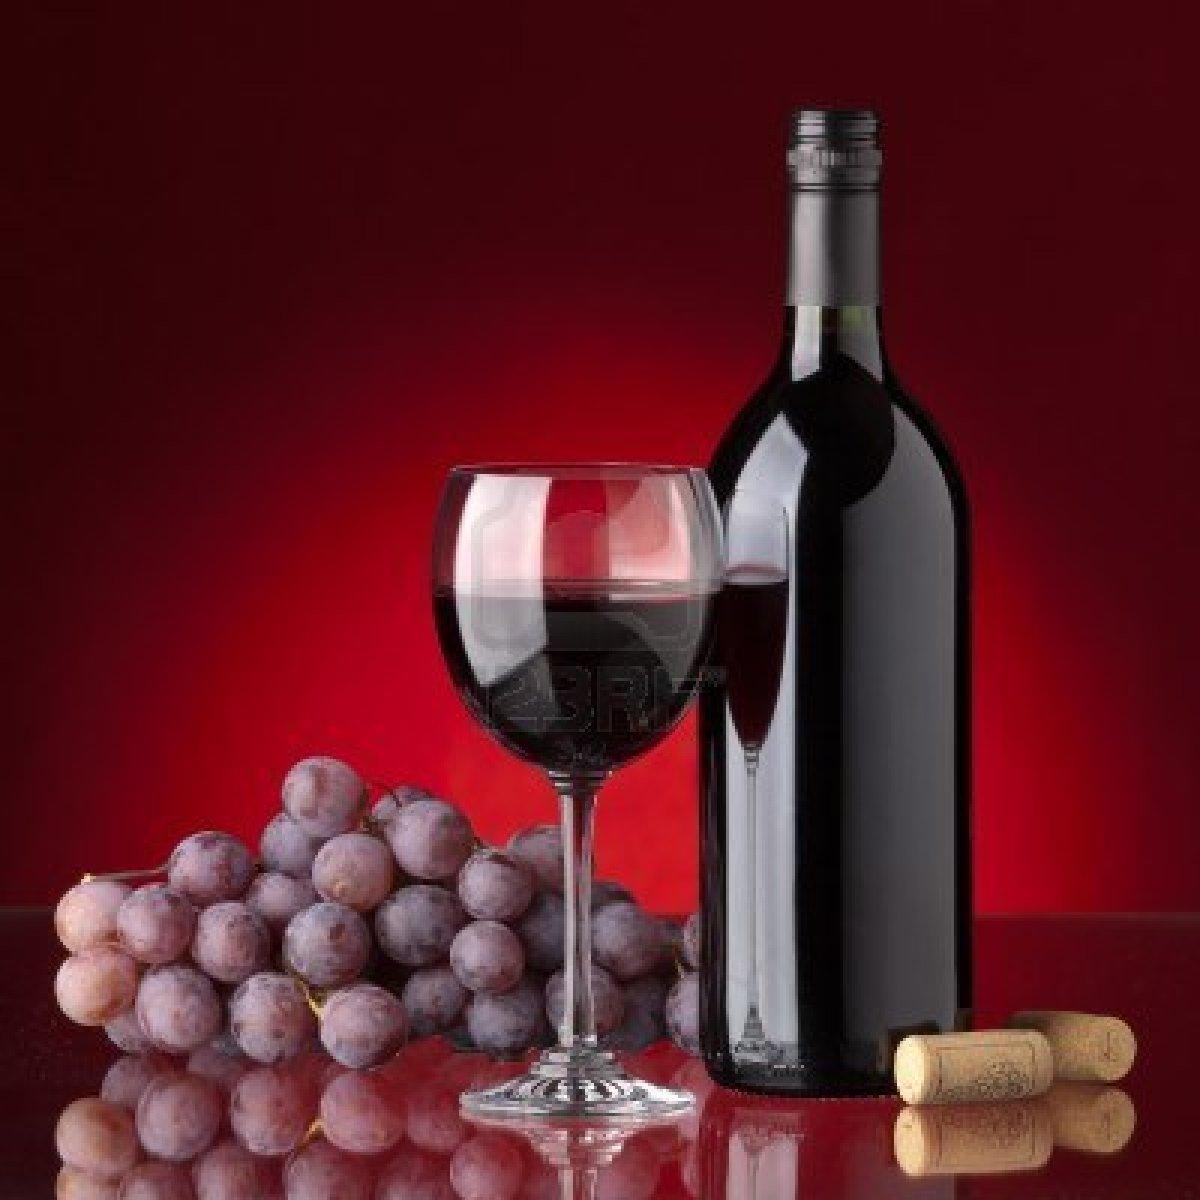 Cata de Vinos-Maridaje-Sumiller